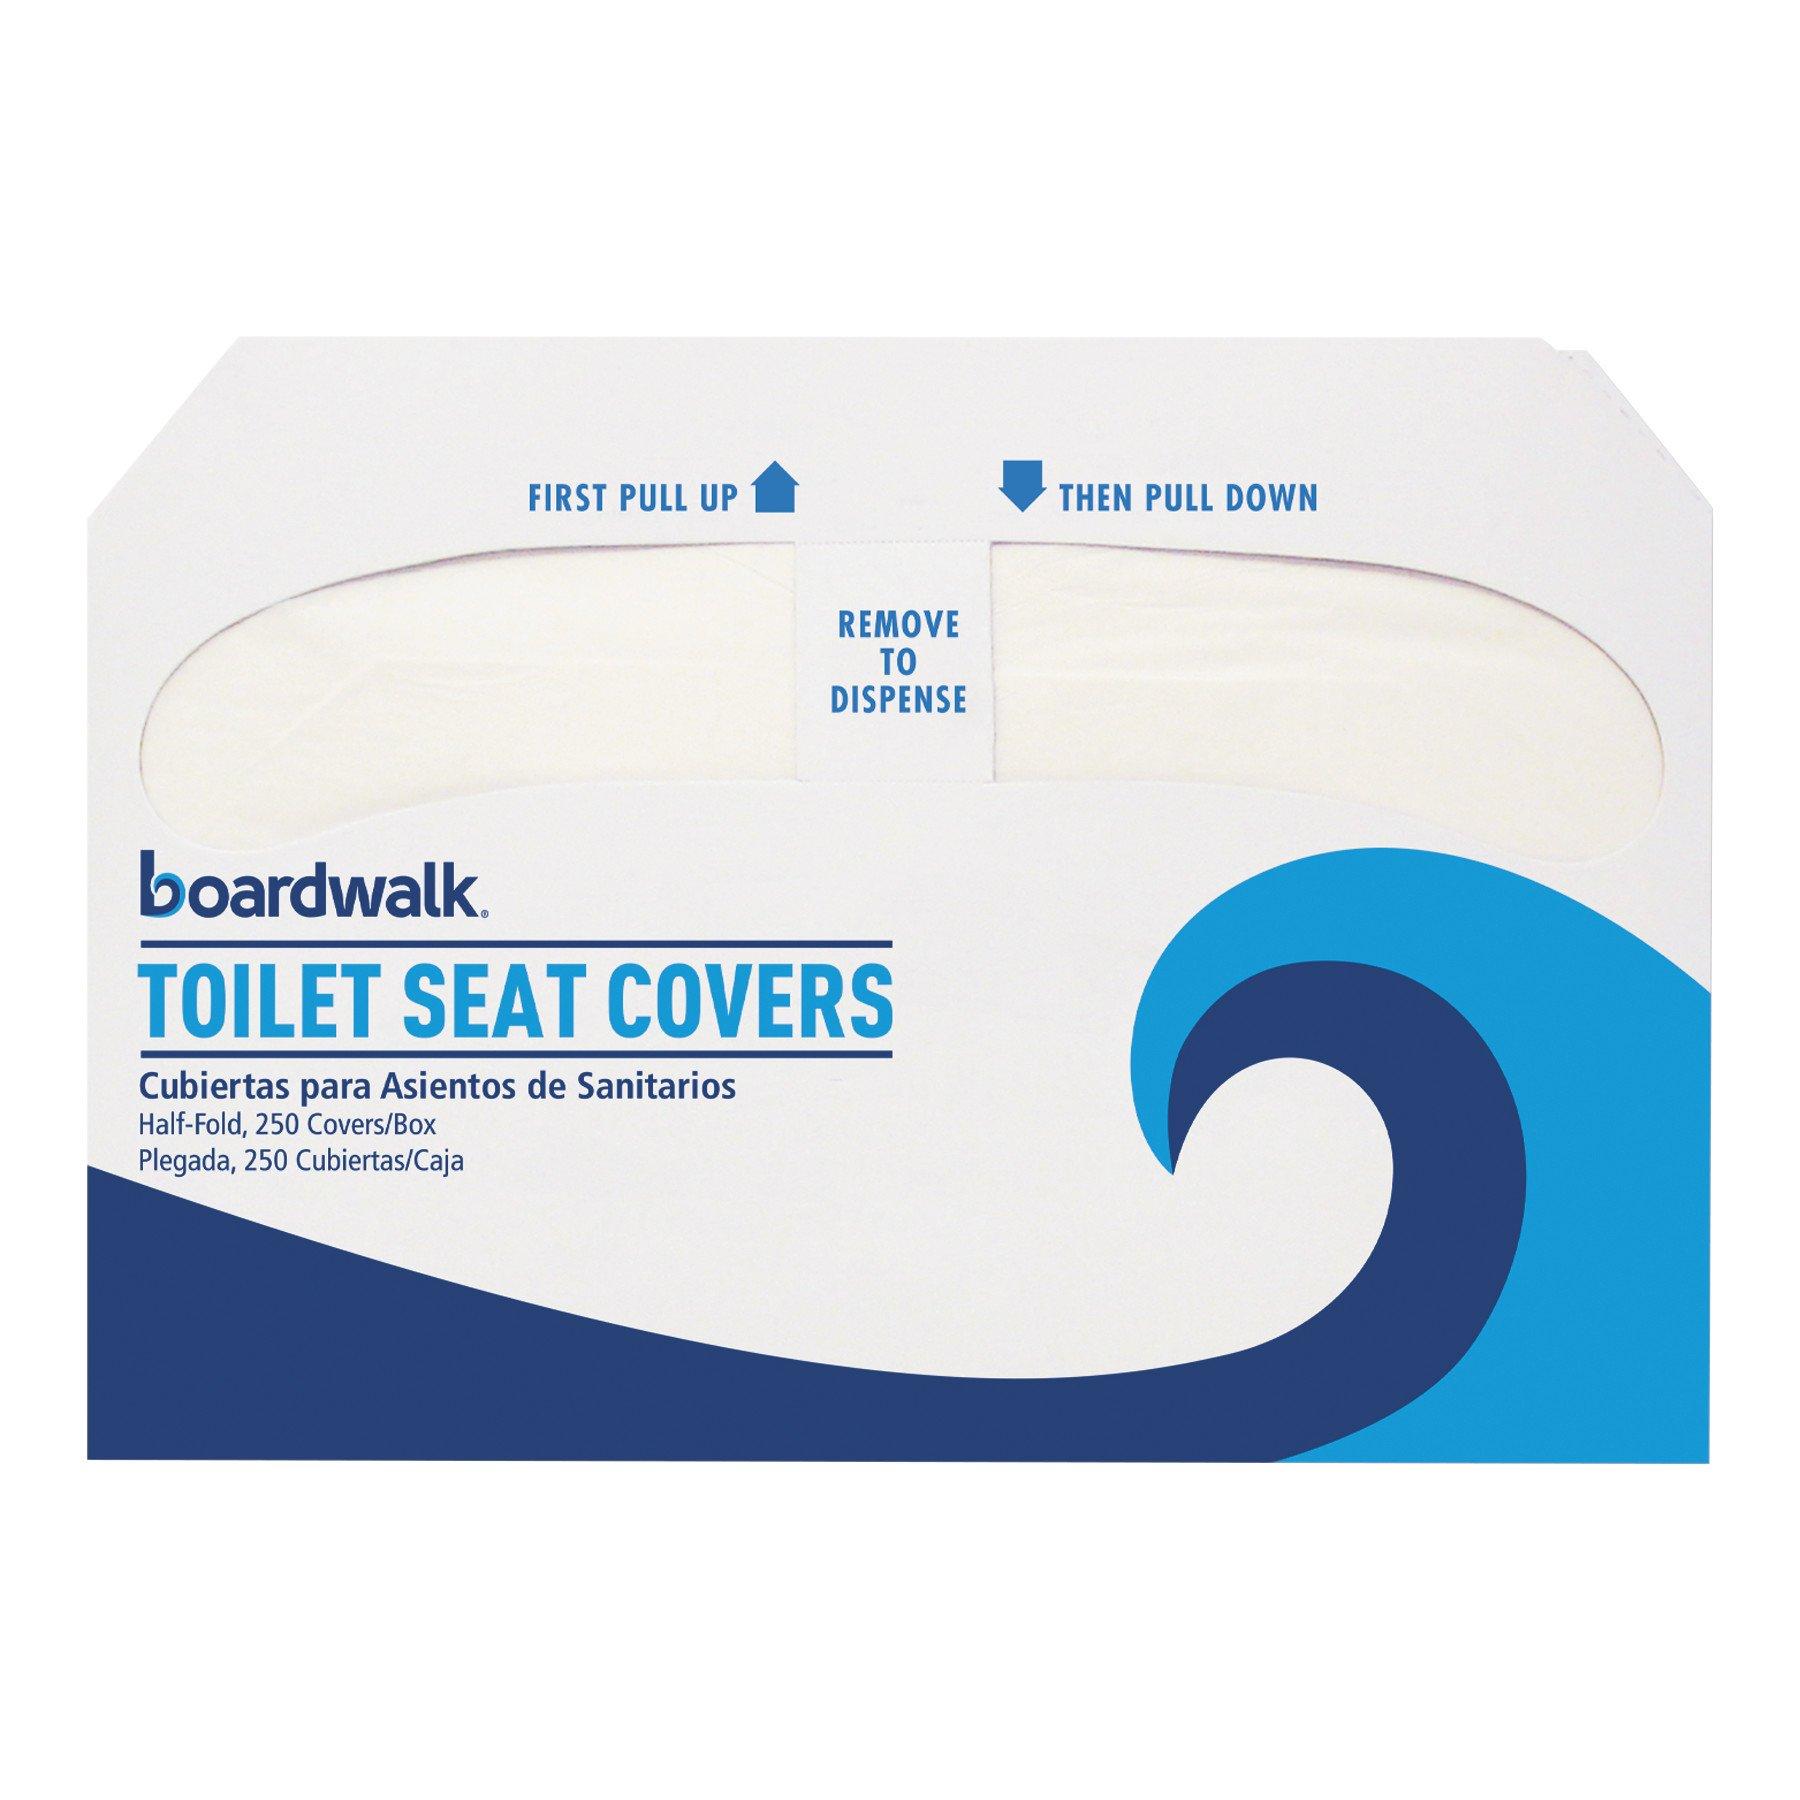 Boardwalk K2500 Premium Half-Fold Toilet Seat Covers, 250 Covers Per Sleeve (Case of 10 Sleeves)